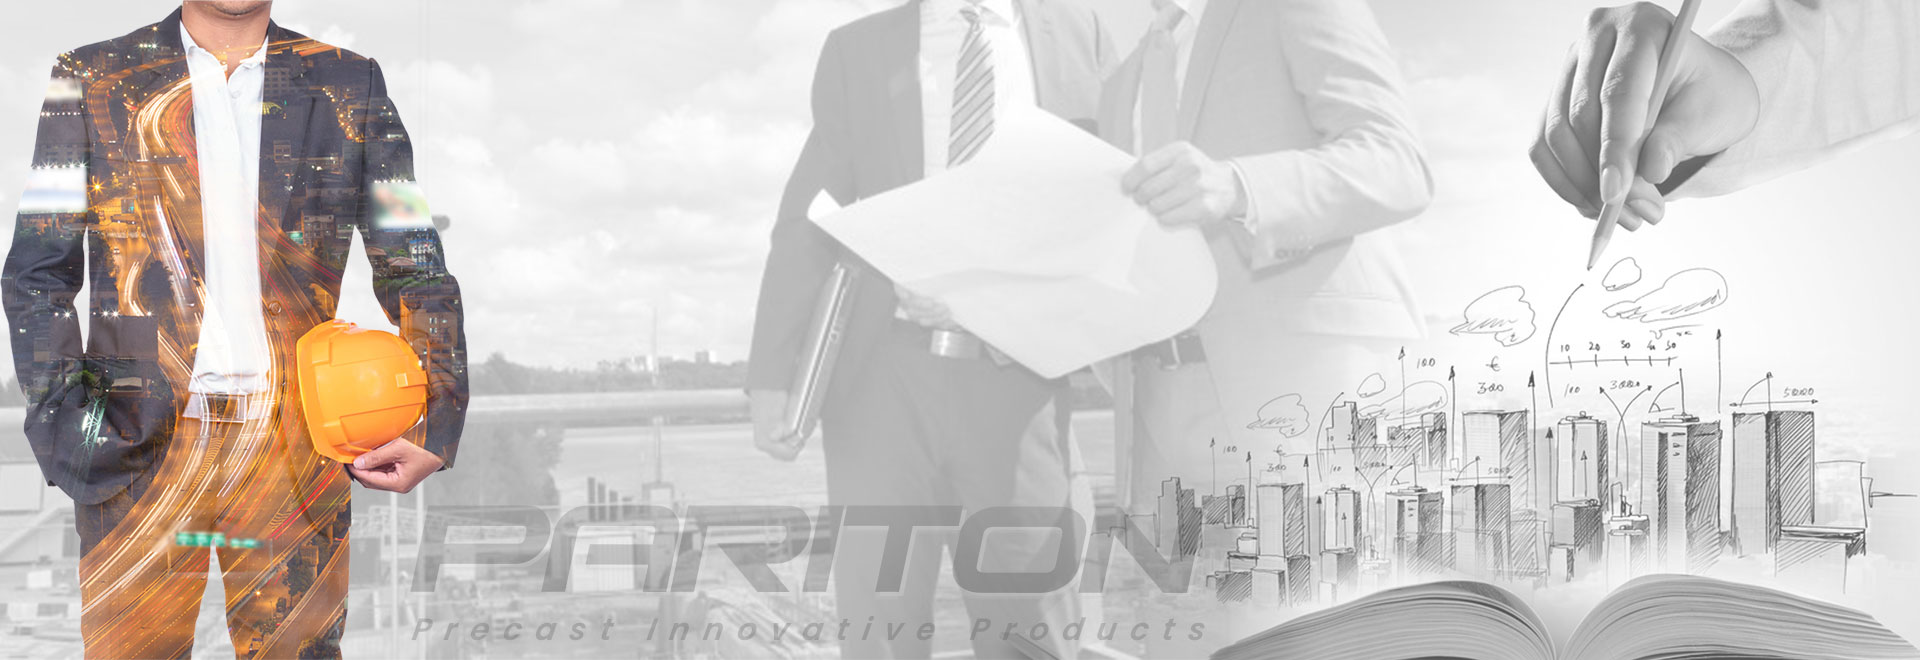 Berikut dibawah ini daftar client Pariton dari produk yang pernah Kerjakan dan kami kirim ke beberapa project :